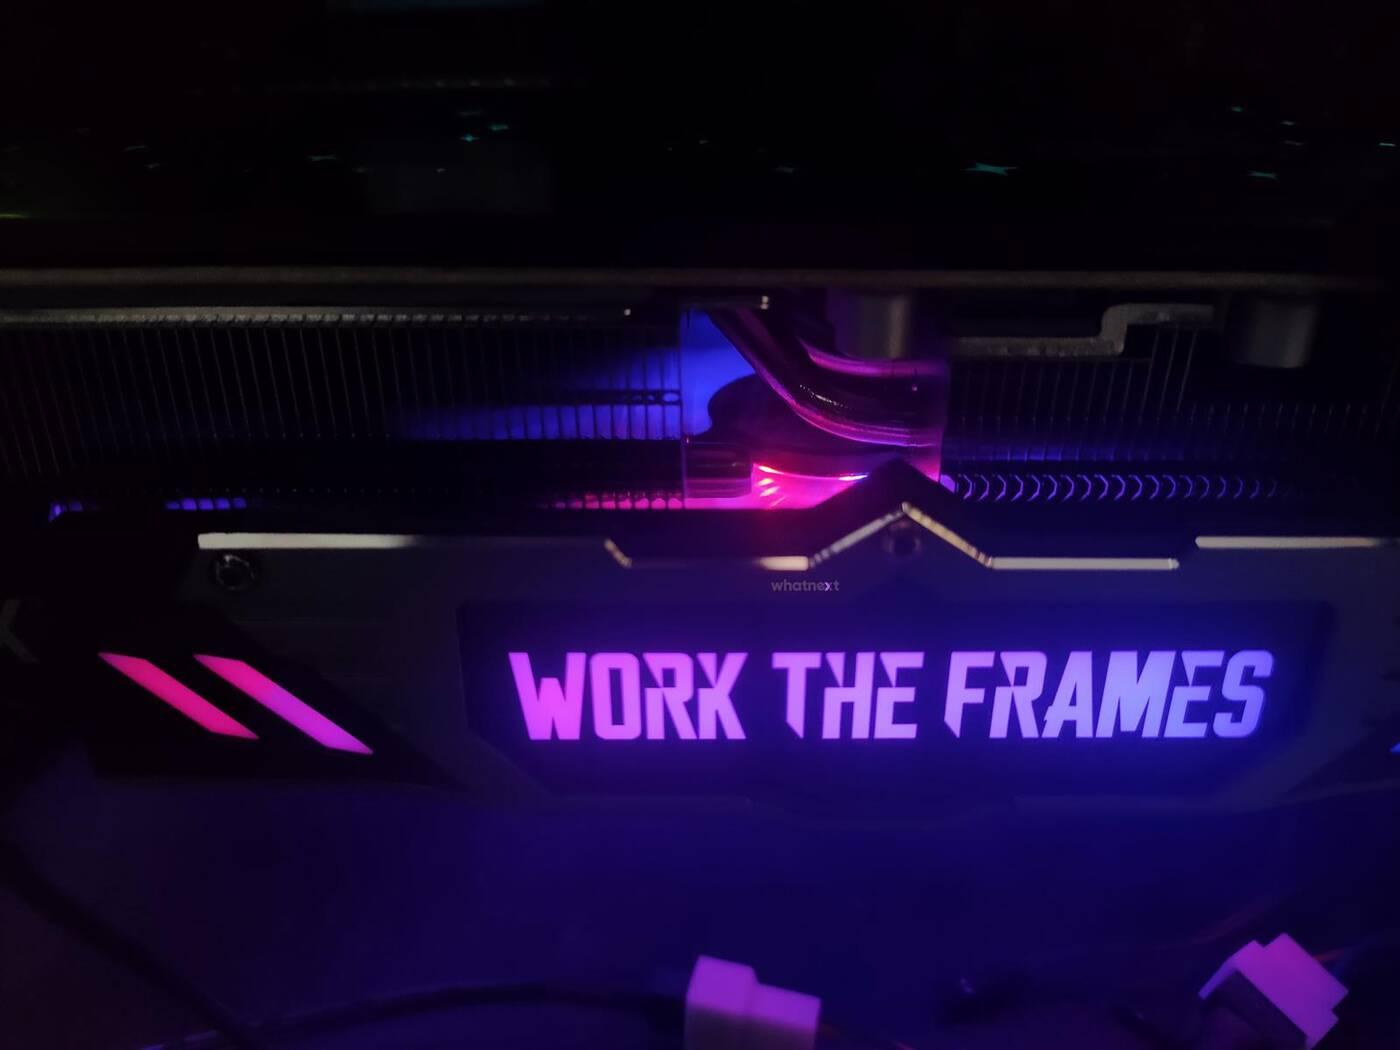 test KFA2 GeForce RTX 2070 SUPER Work The Frames, recenzja KFA2 GeForce RTX 2070 SUPER Work The Frames, review KFA2 GeForce RTX 2070 SUPER Work The Frames